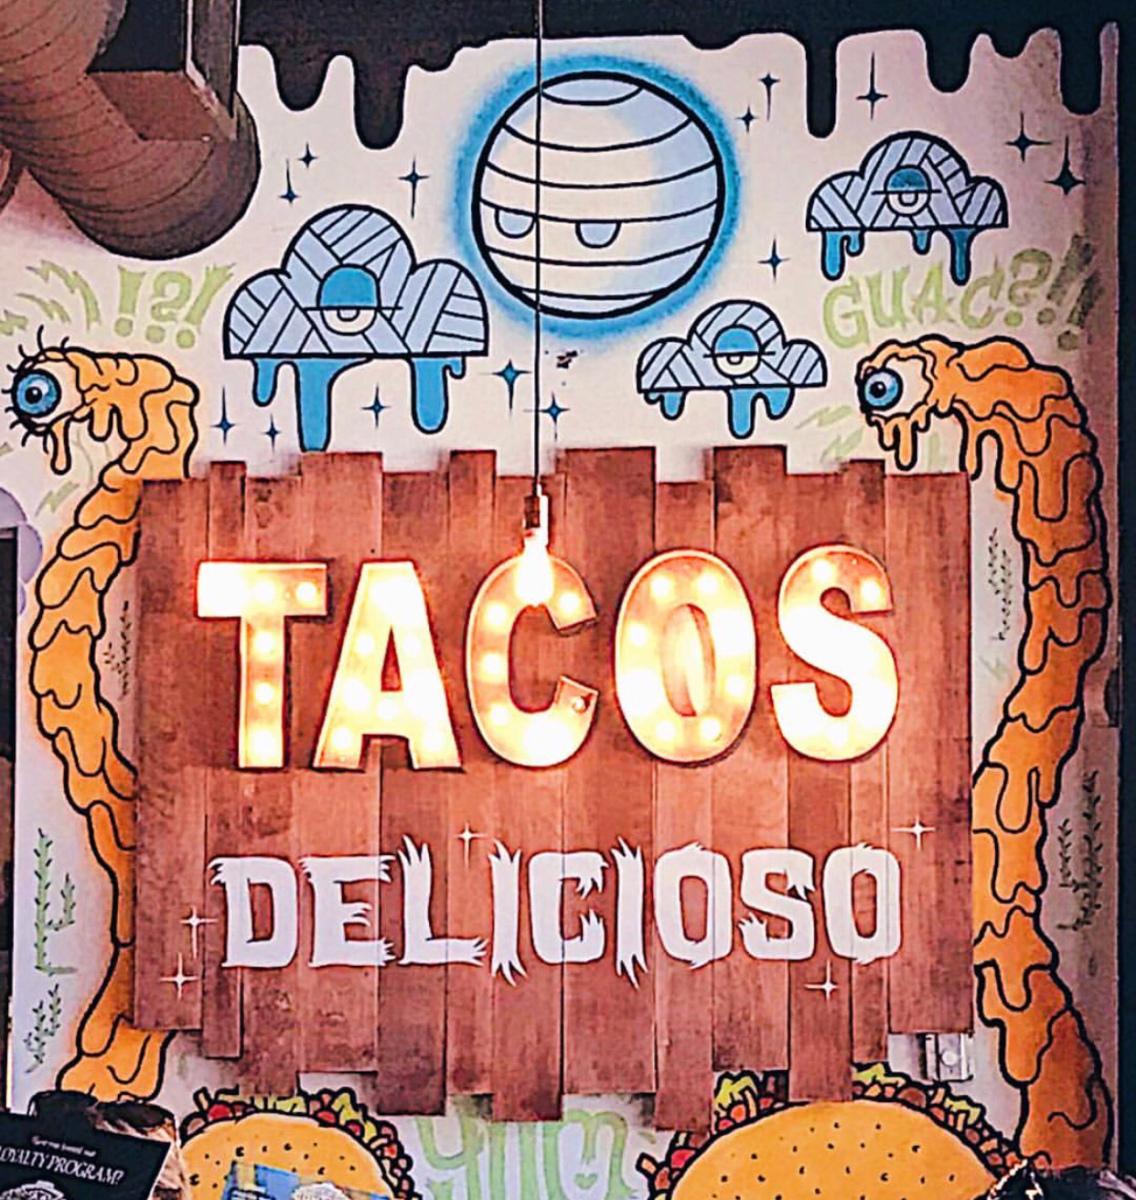 @itslindsayanderson's cover photo for 'TACO TUESDAY: CONDADO TACOS'